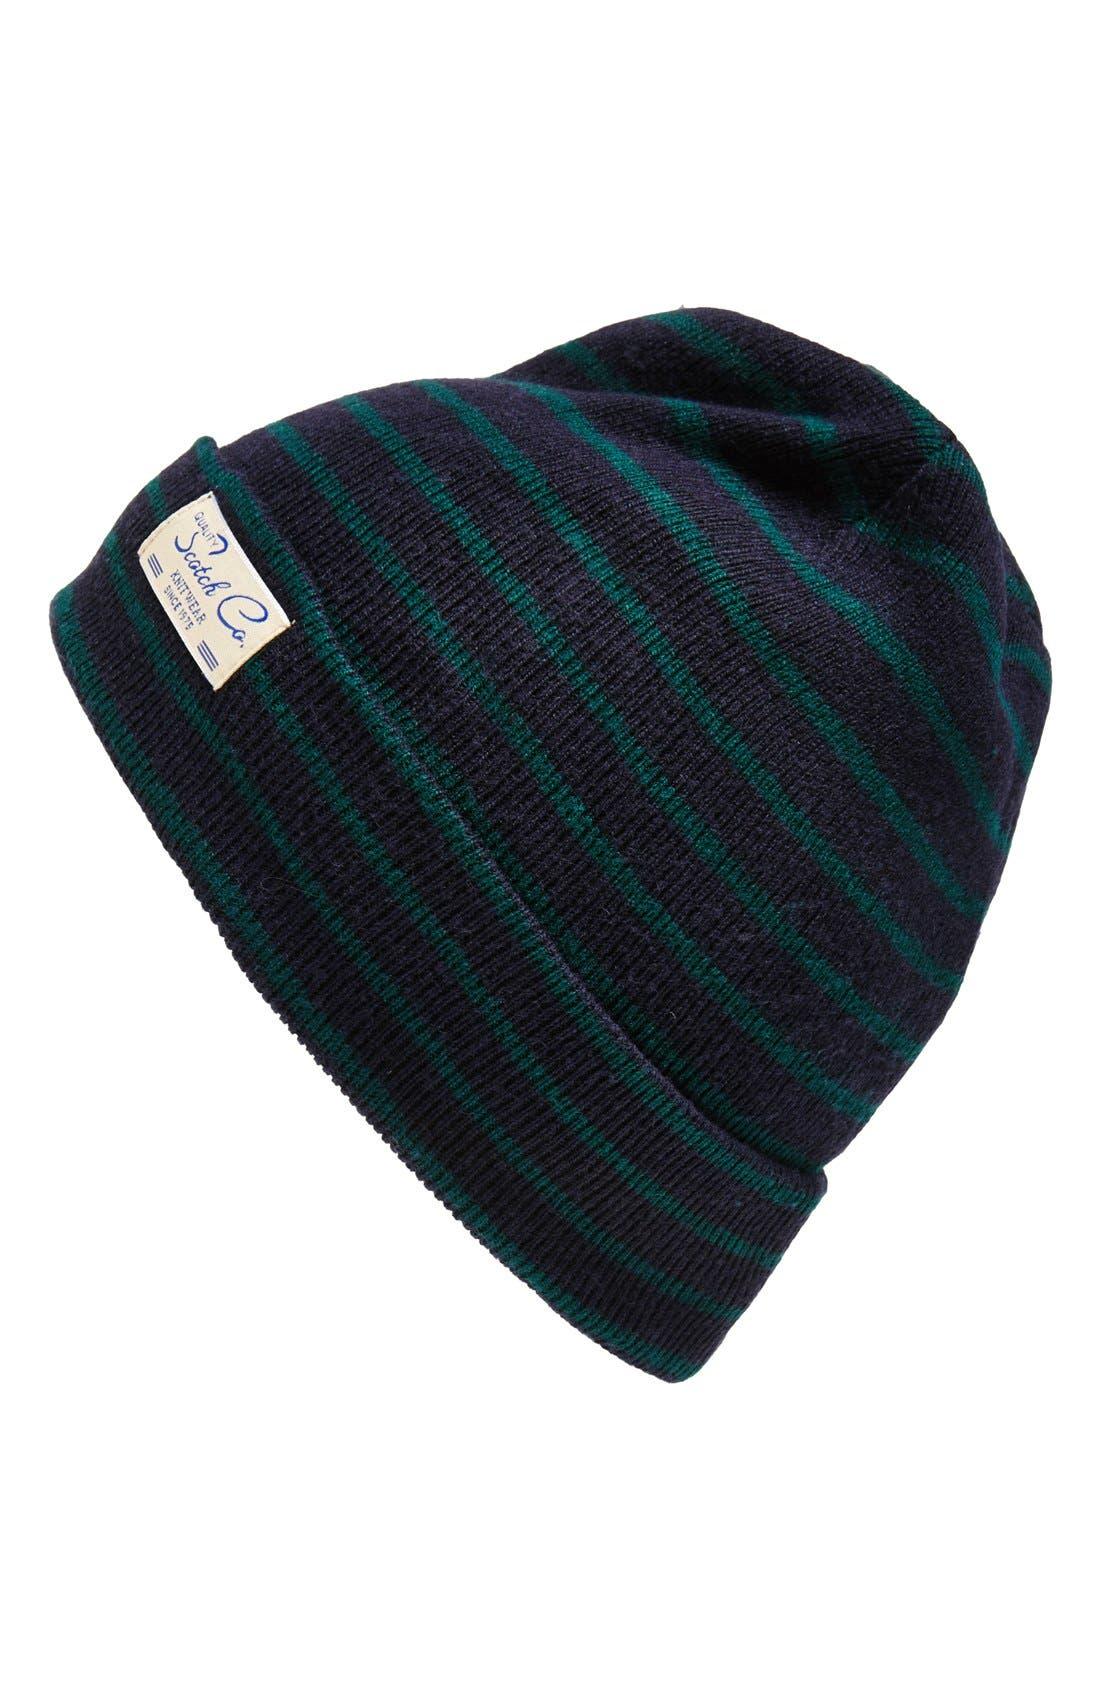 Alternate Image 1 Selected - Scotch & Soda Stripe Knit Cap